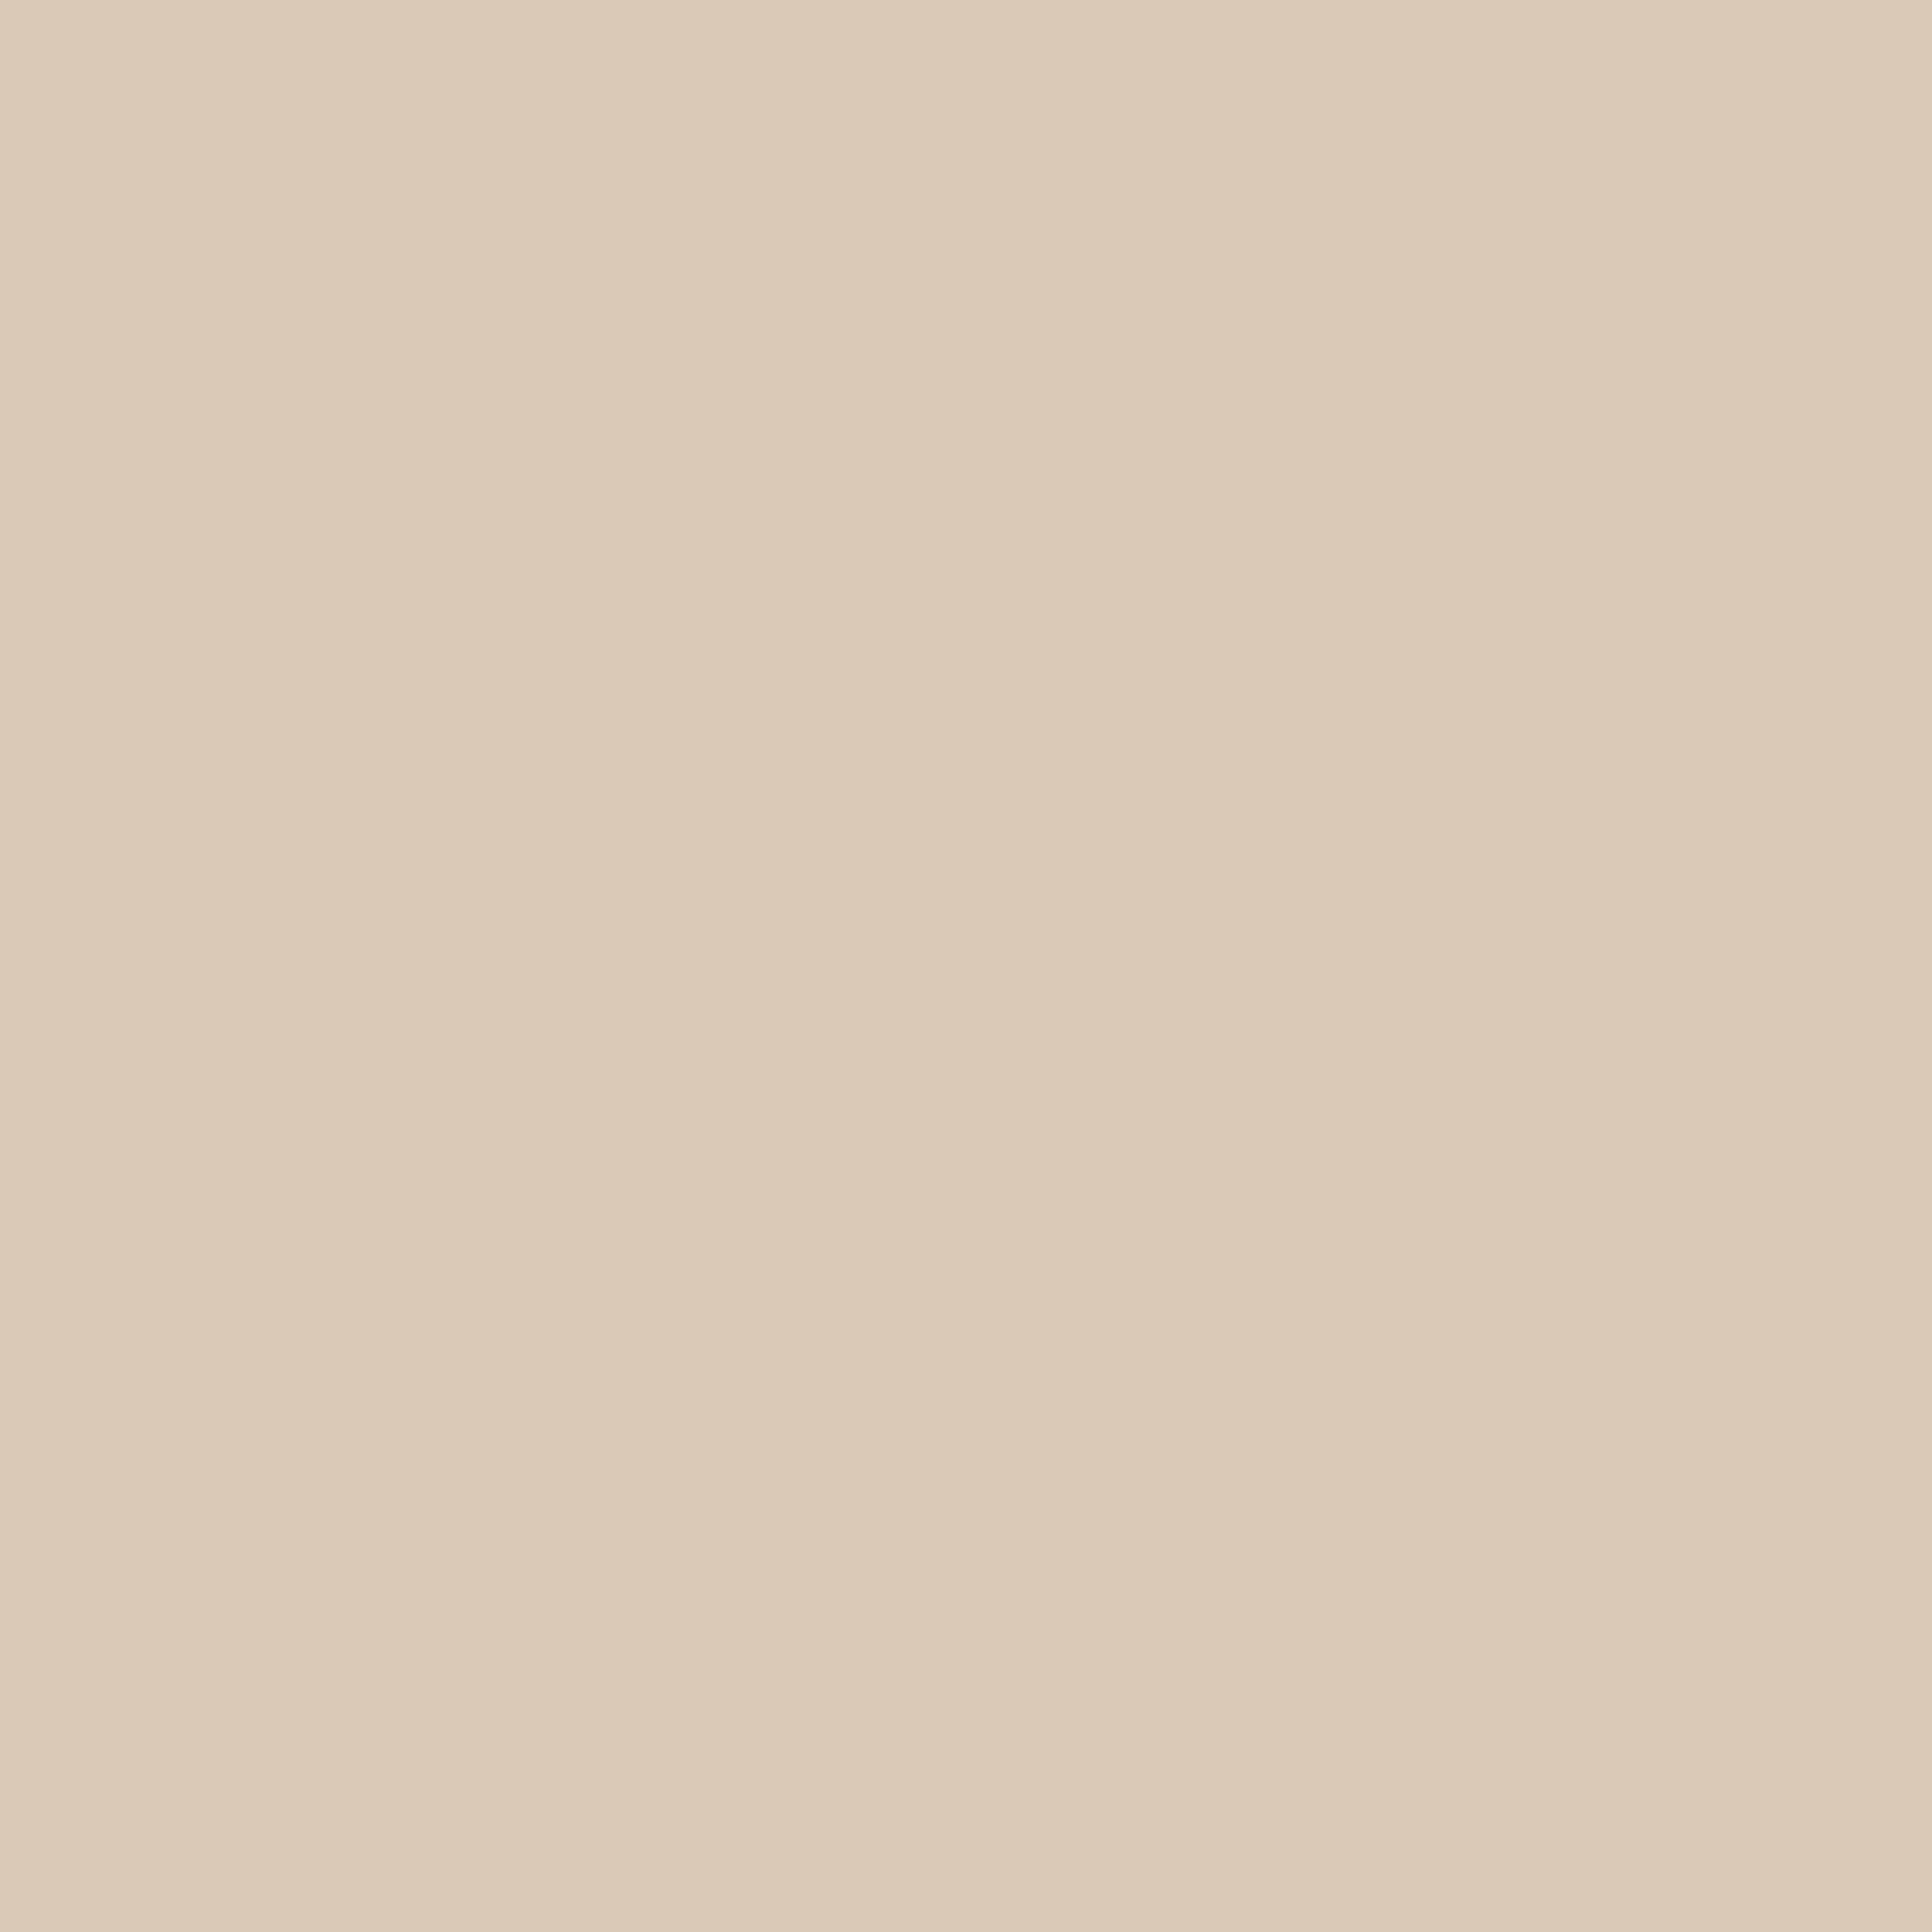 Klebefolie beige einfarbig macchiato selbstklebende folie for Klebefolie lila